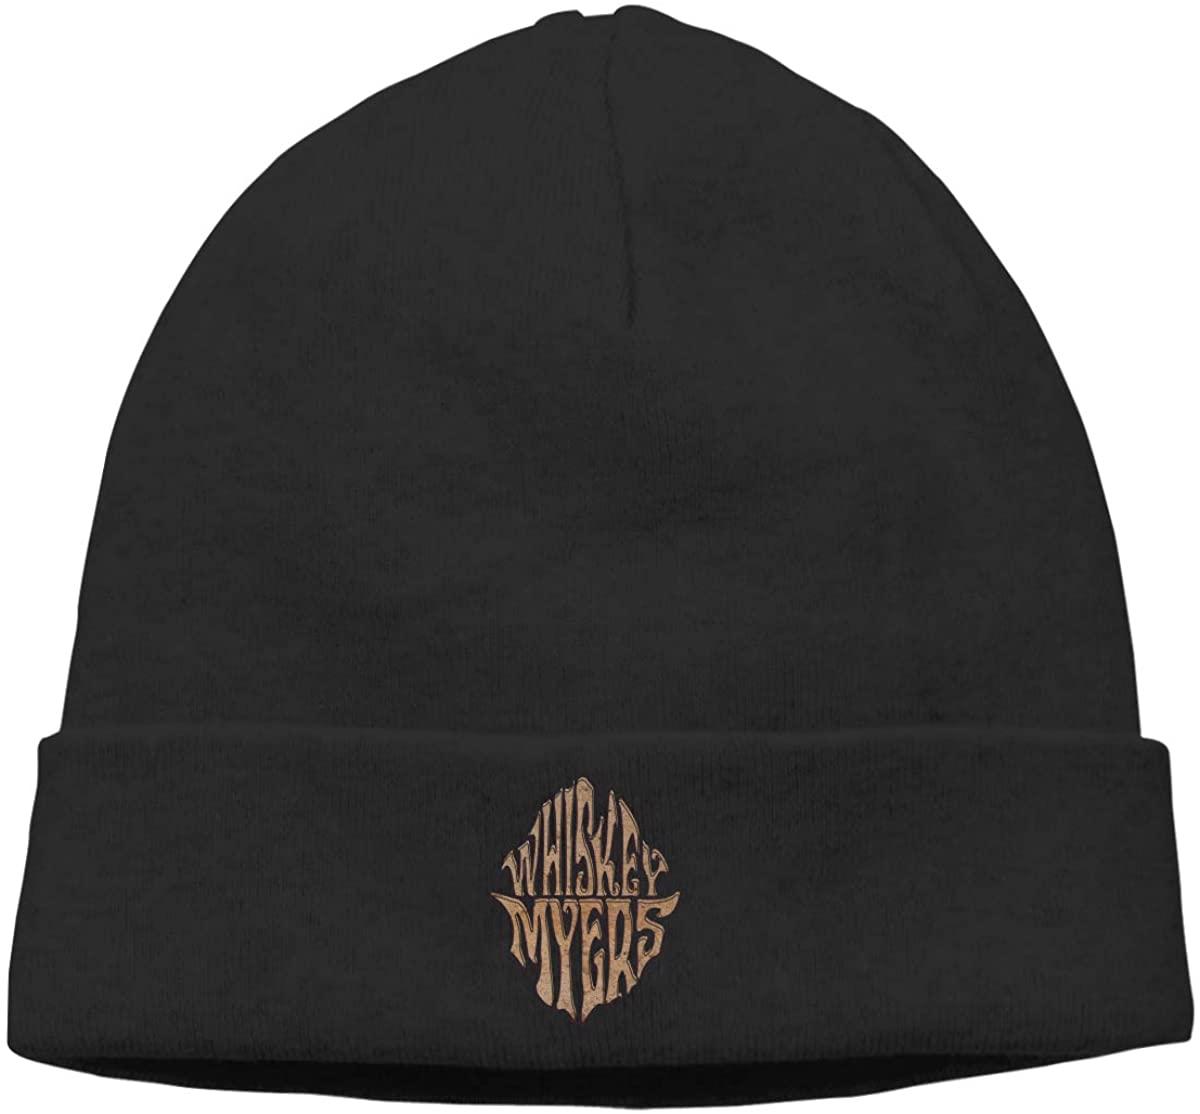 JaoStep Whiskey Myers Unisex Beanie Caps Knitting Hat Warm Hedging Cap Men Women Thin Section